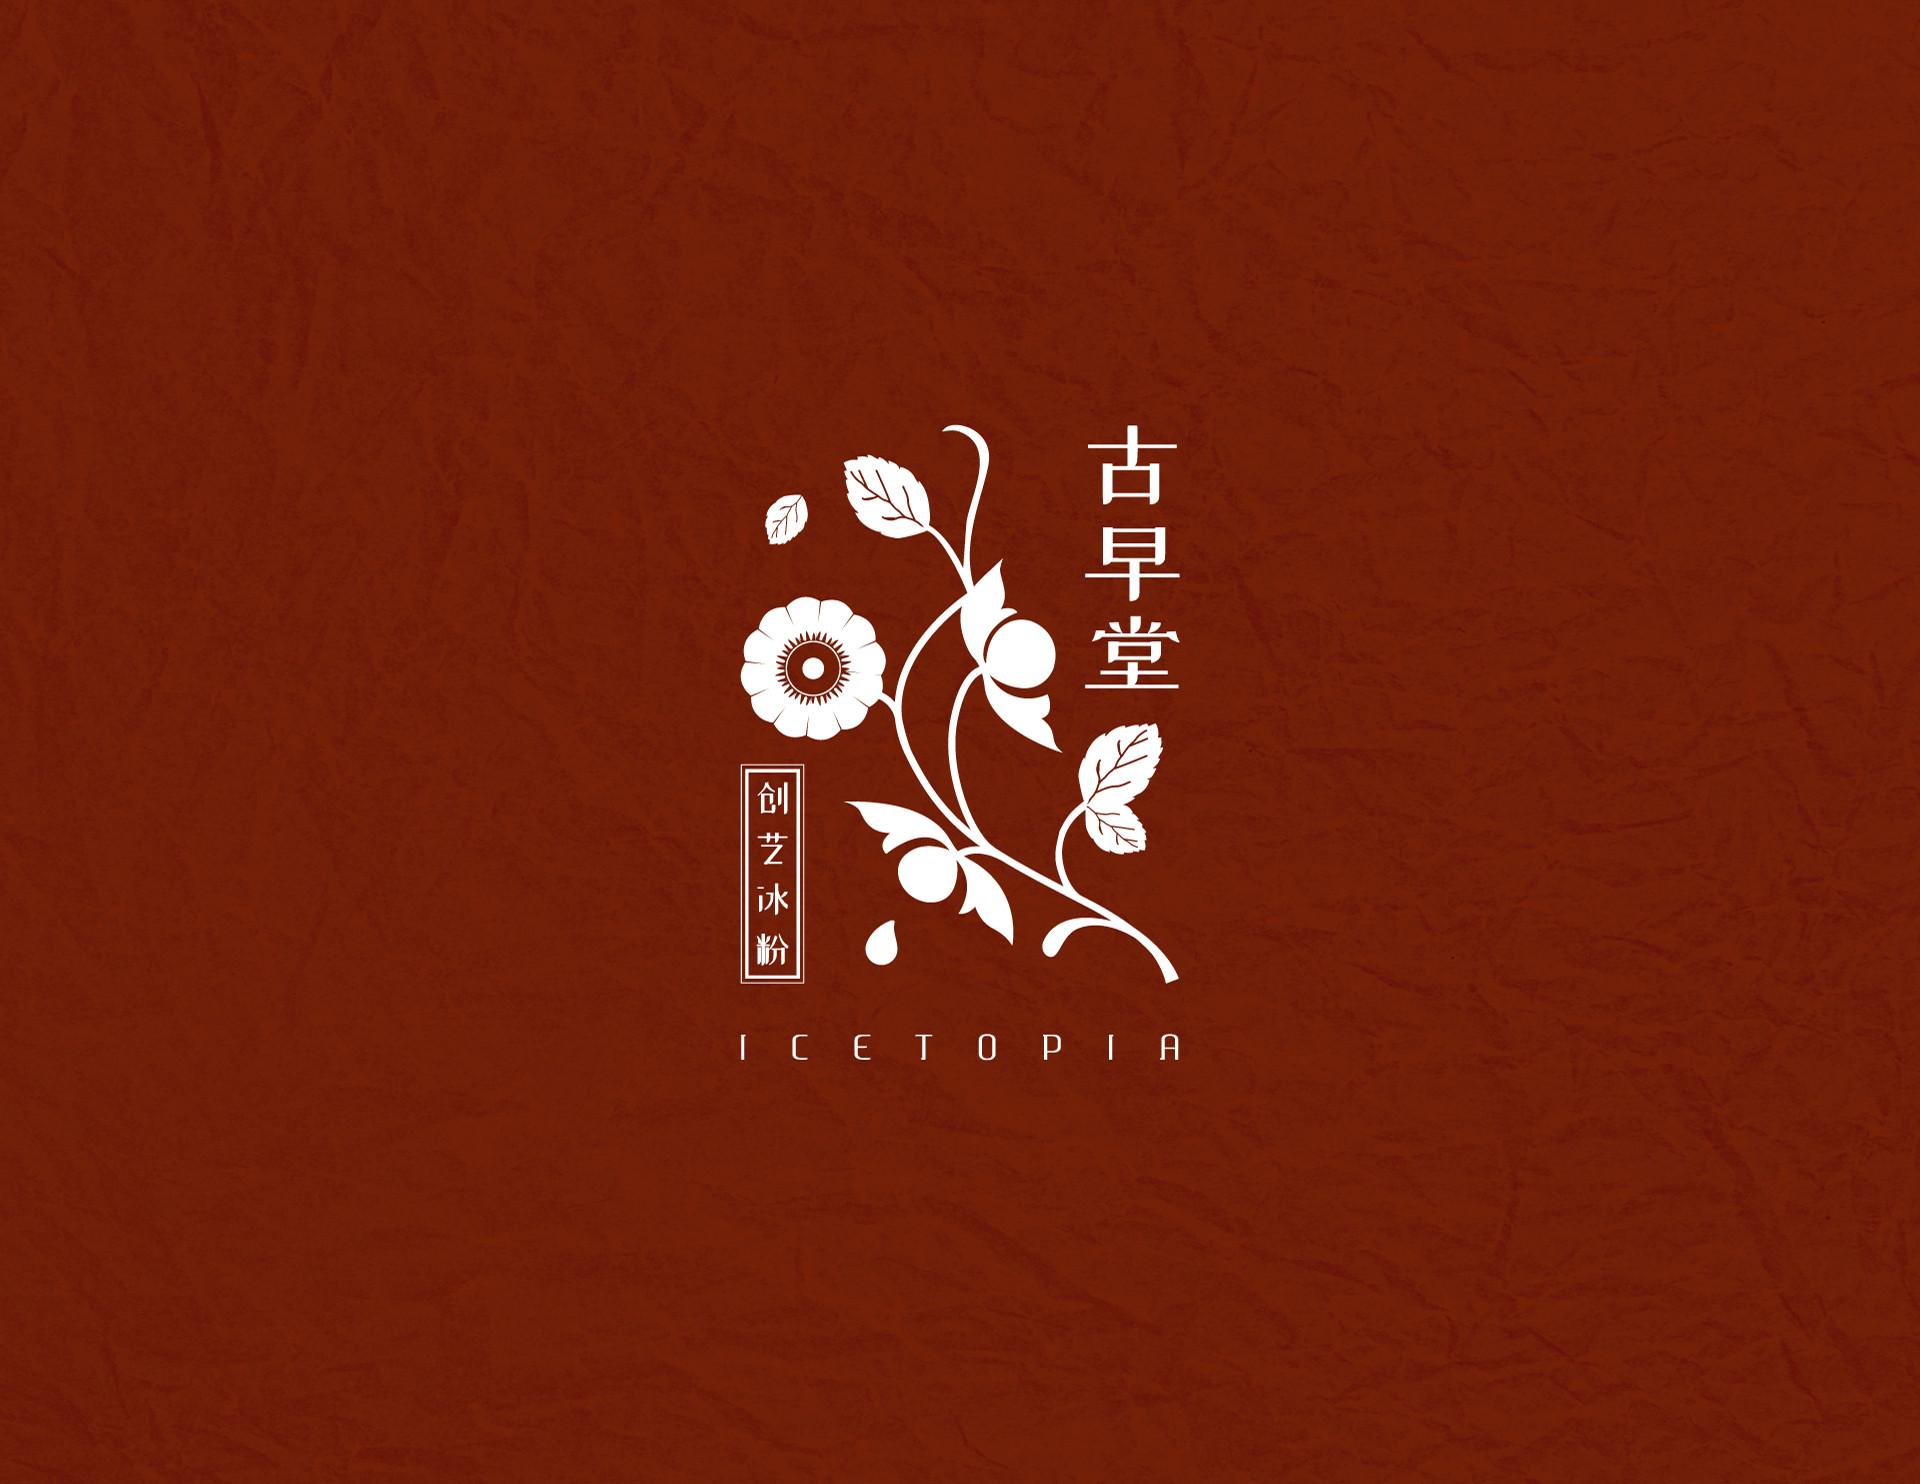 Icetopia Logo